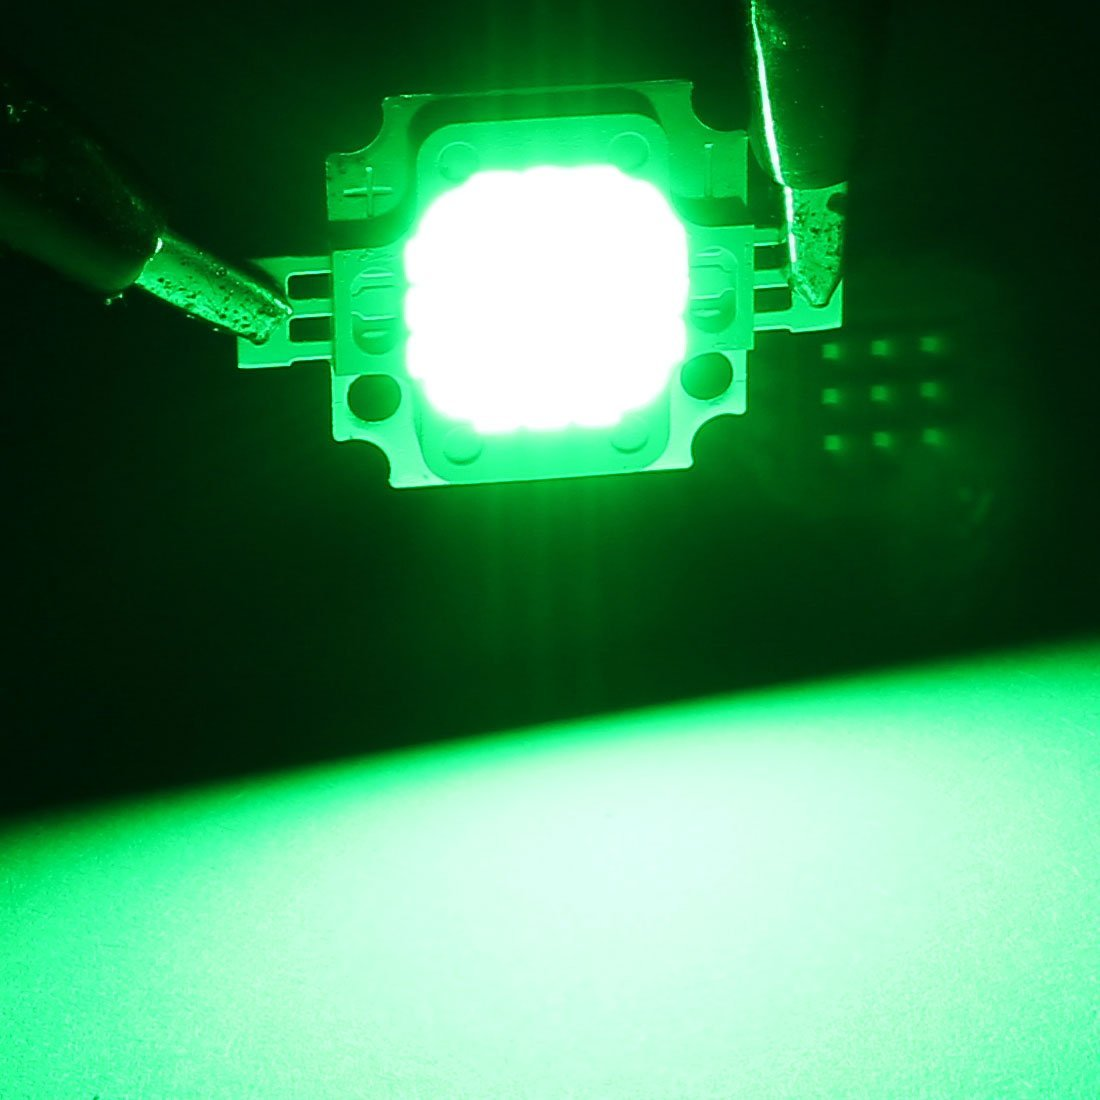 29mmx20mm eDealMax DC 27-30V 10W SMD LED verde viruta luz de inundación de grano de la lámpara - - Amazon.com